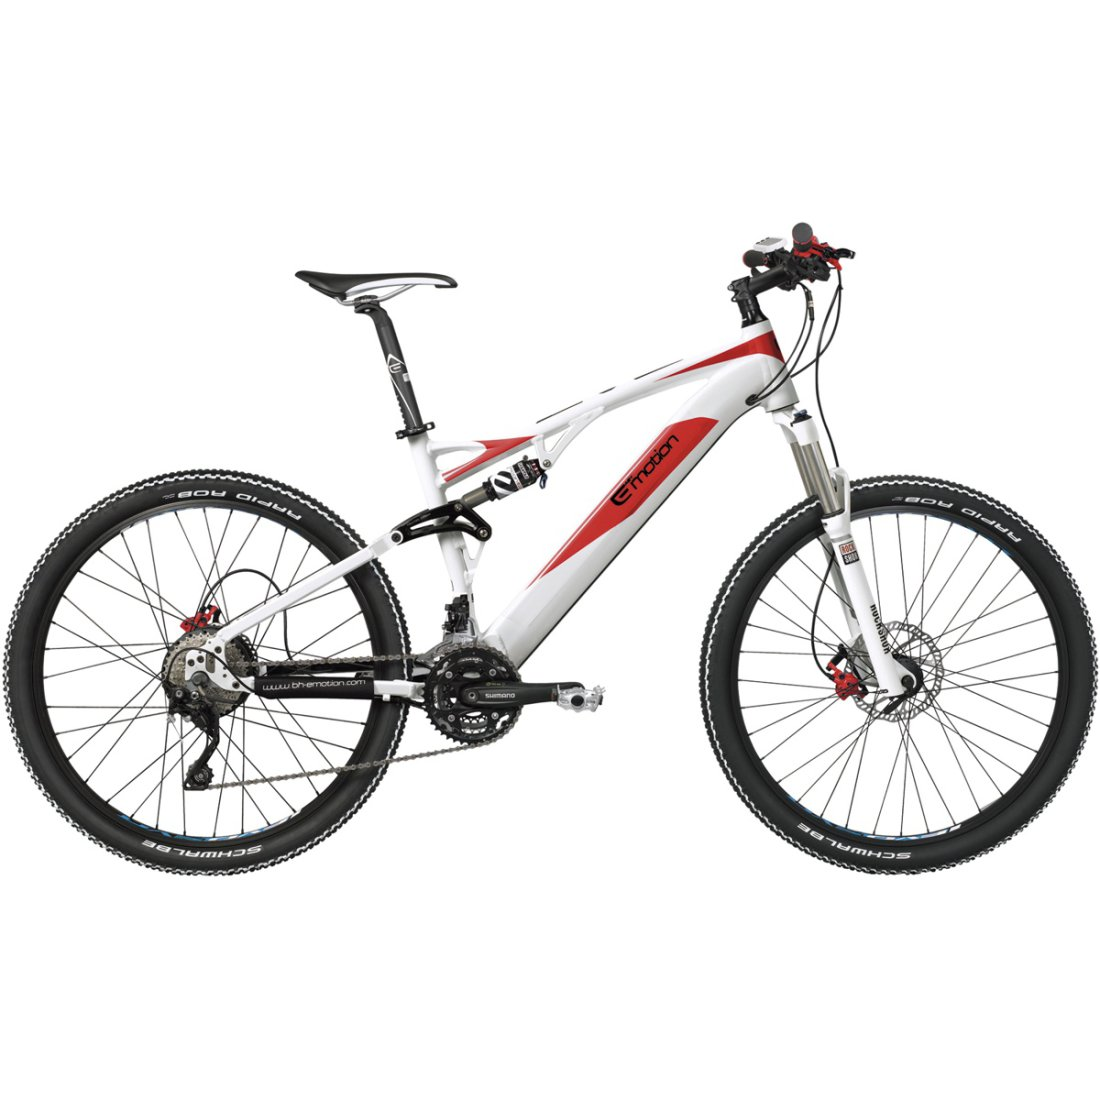 Bh Evo Jumper 275 2015 White Red Mountainbike Motocard